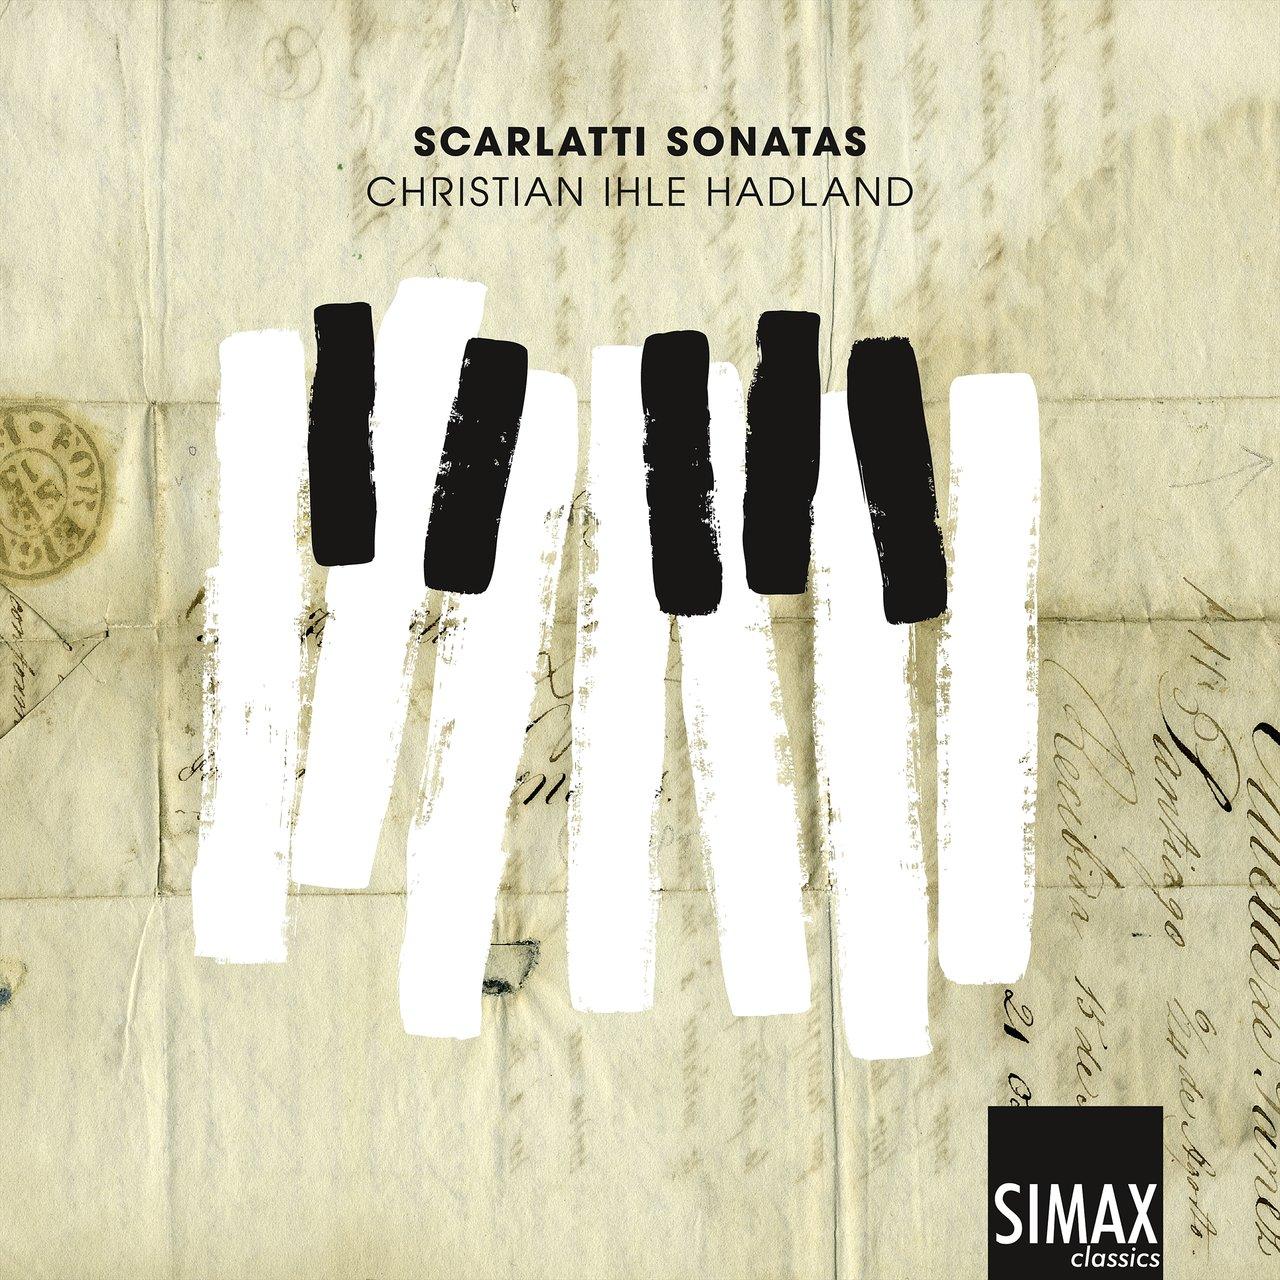 christian ihle hadland - scarlatti sonatas.jpg